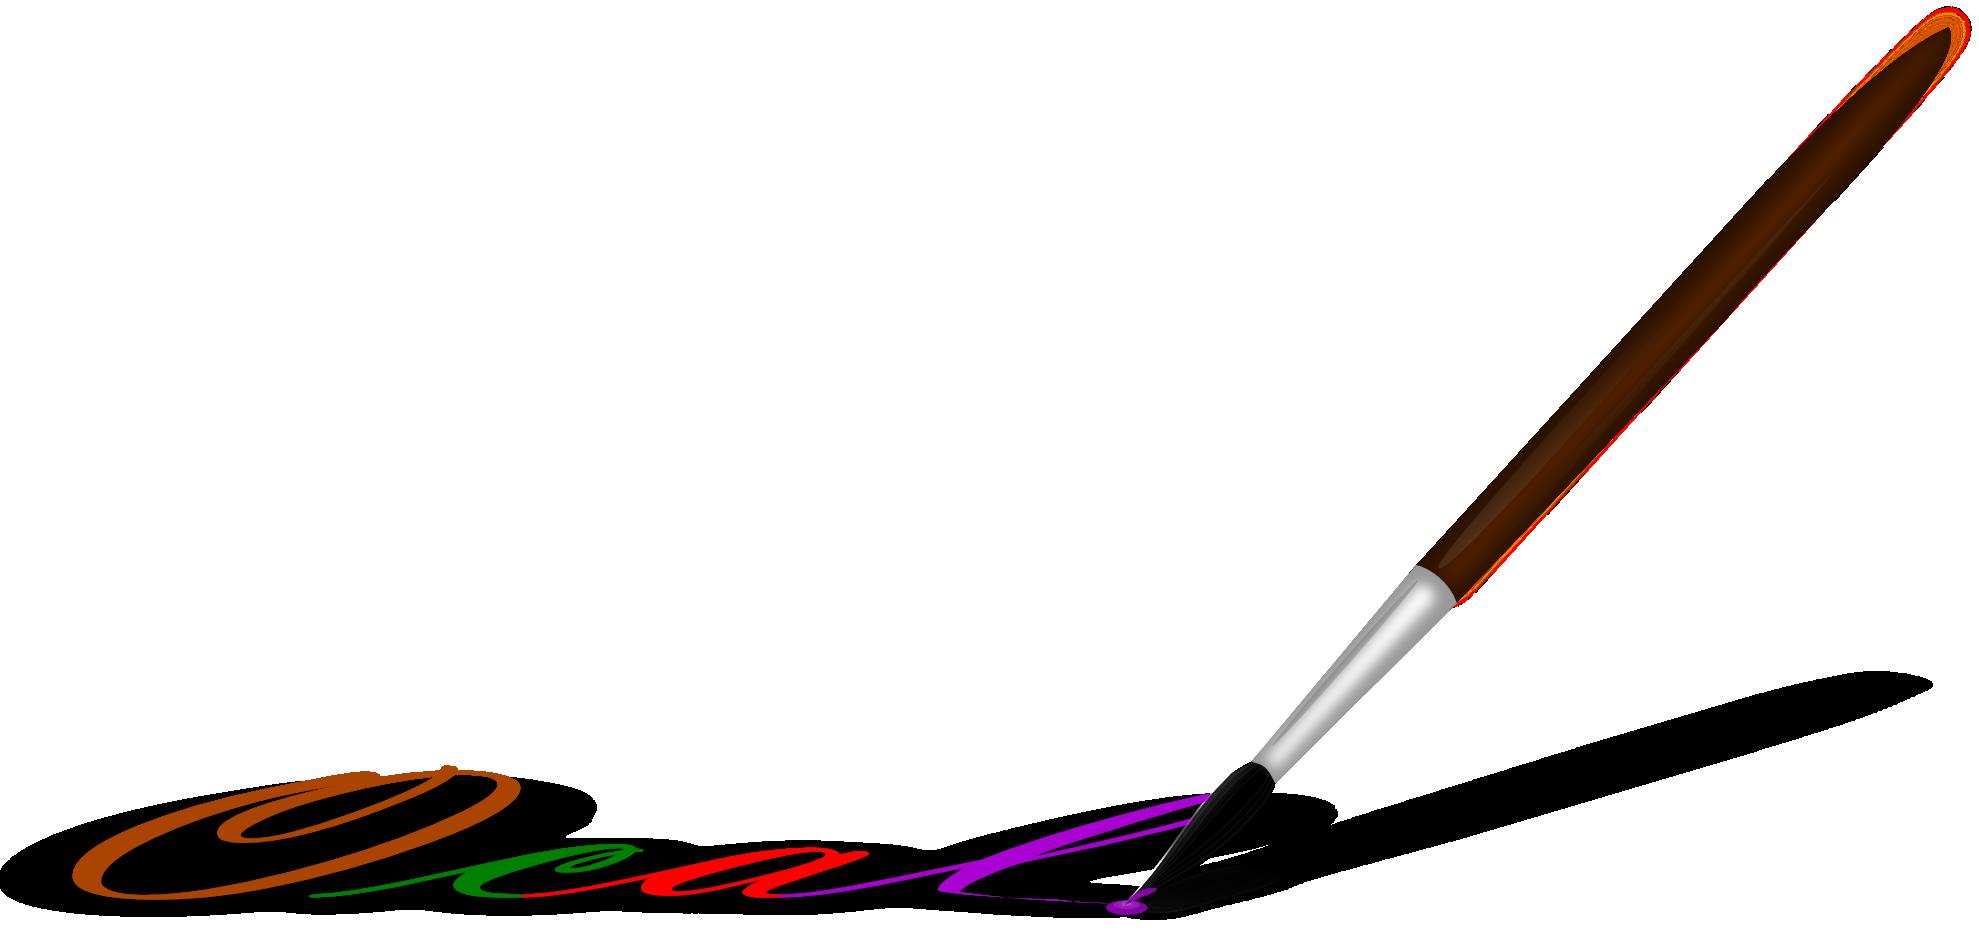 Brush clipart #5, Download drawings